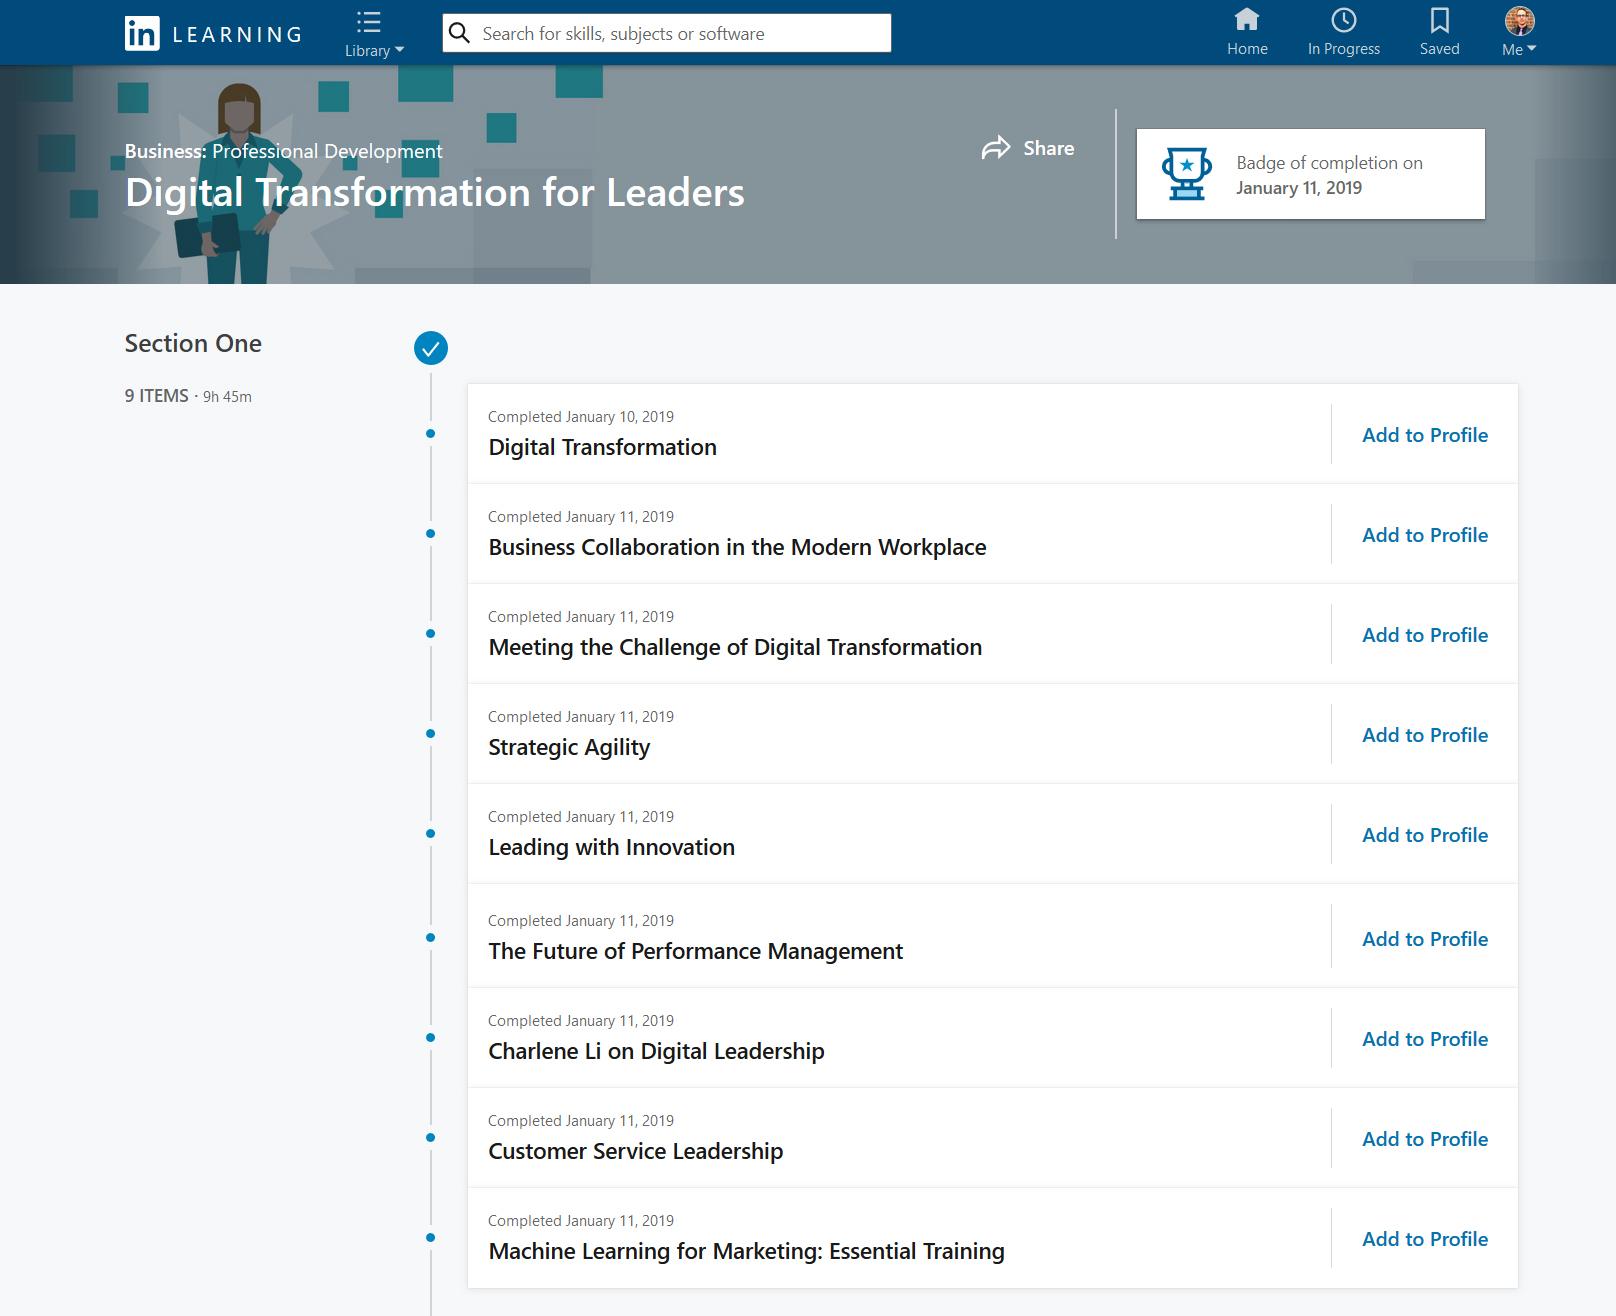 Matthew Bardeleben - Inclusive Leadership Certification - LinkedIn Learning Path